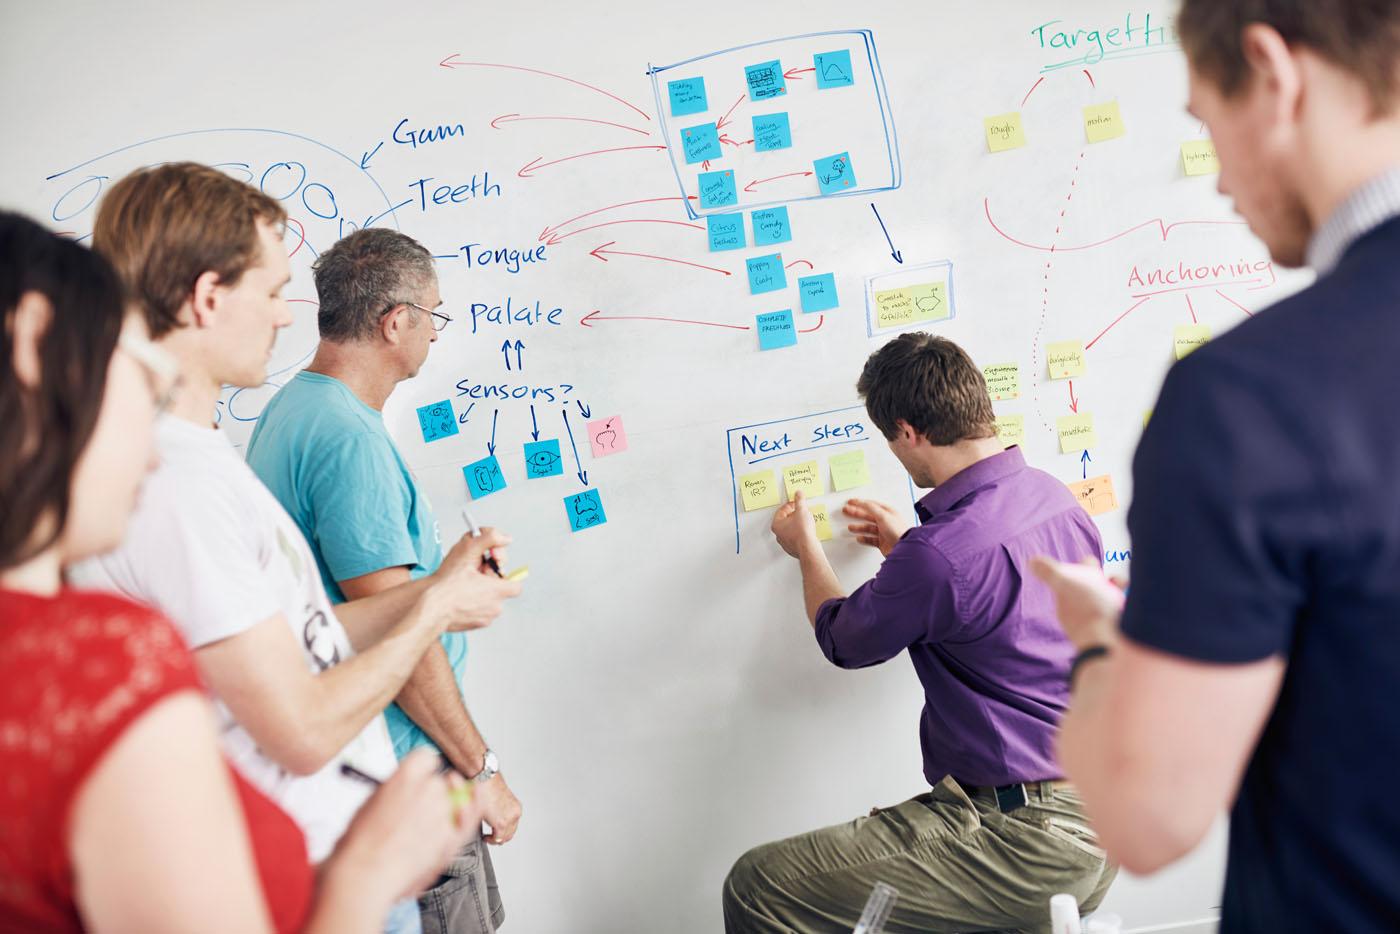 Team ideas generation